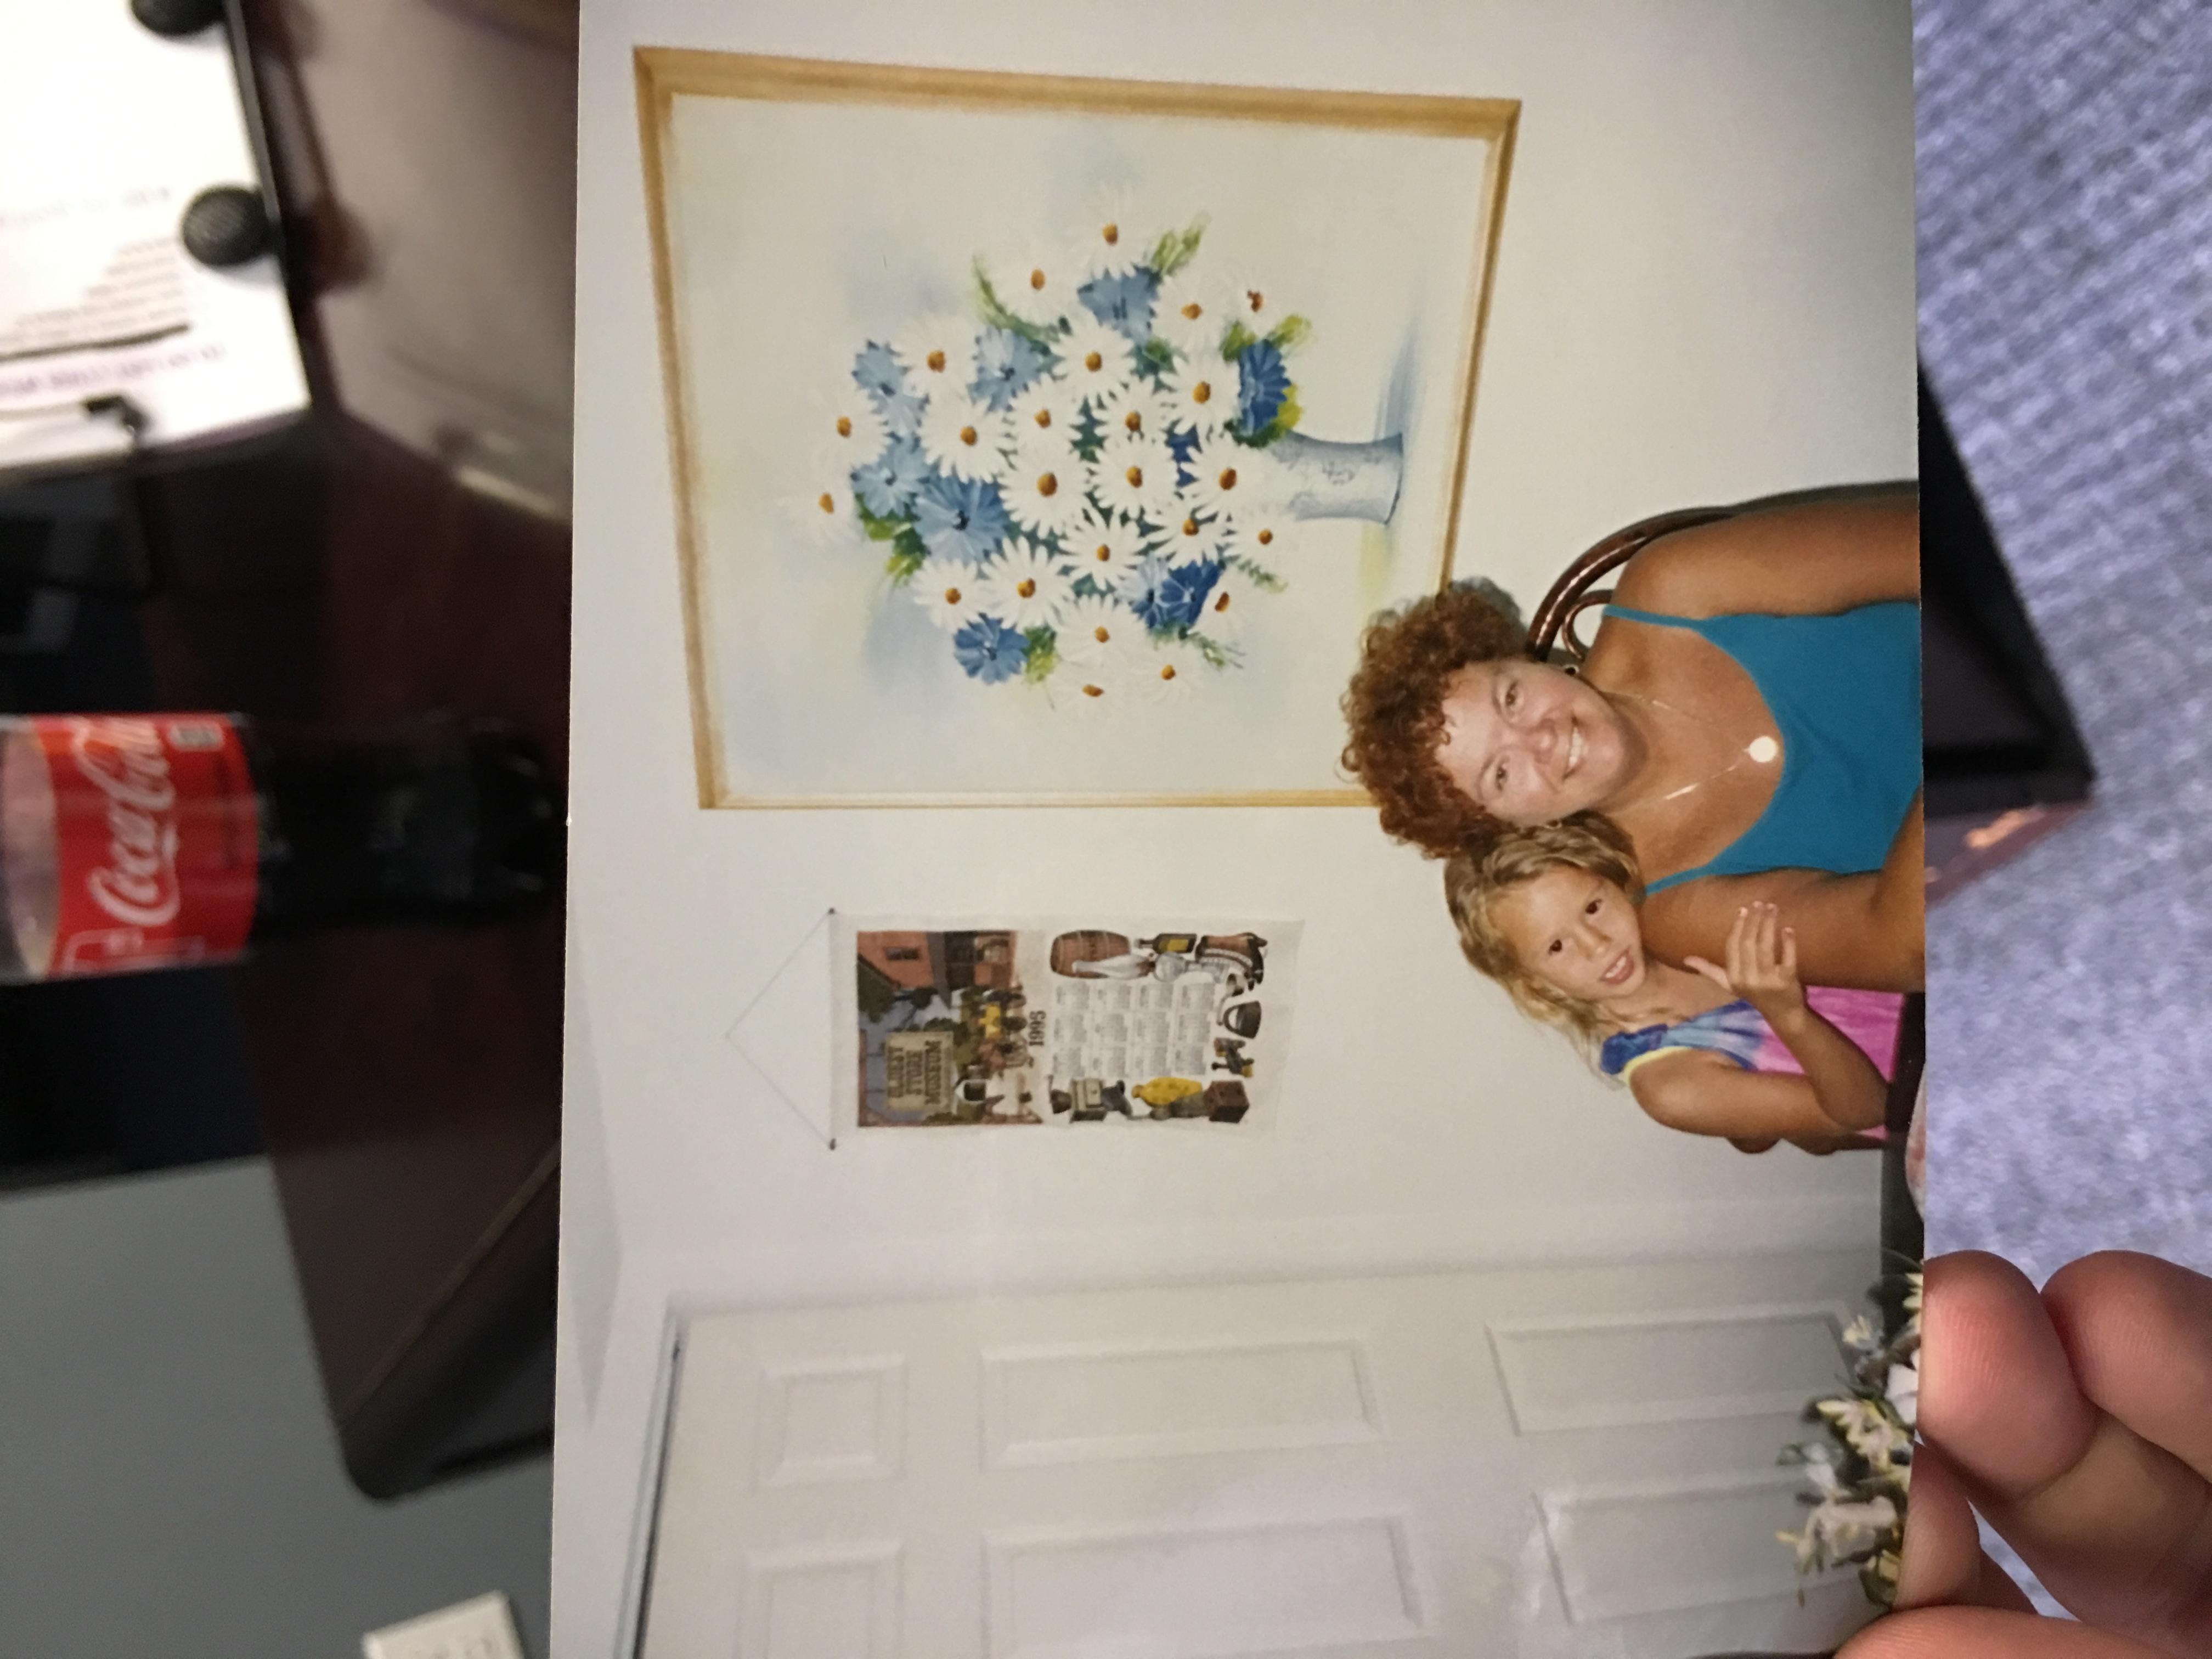 Me and my grandma. RIP Pants. Love you always.